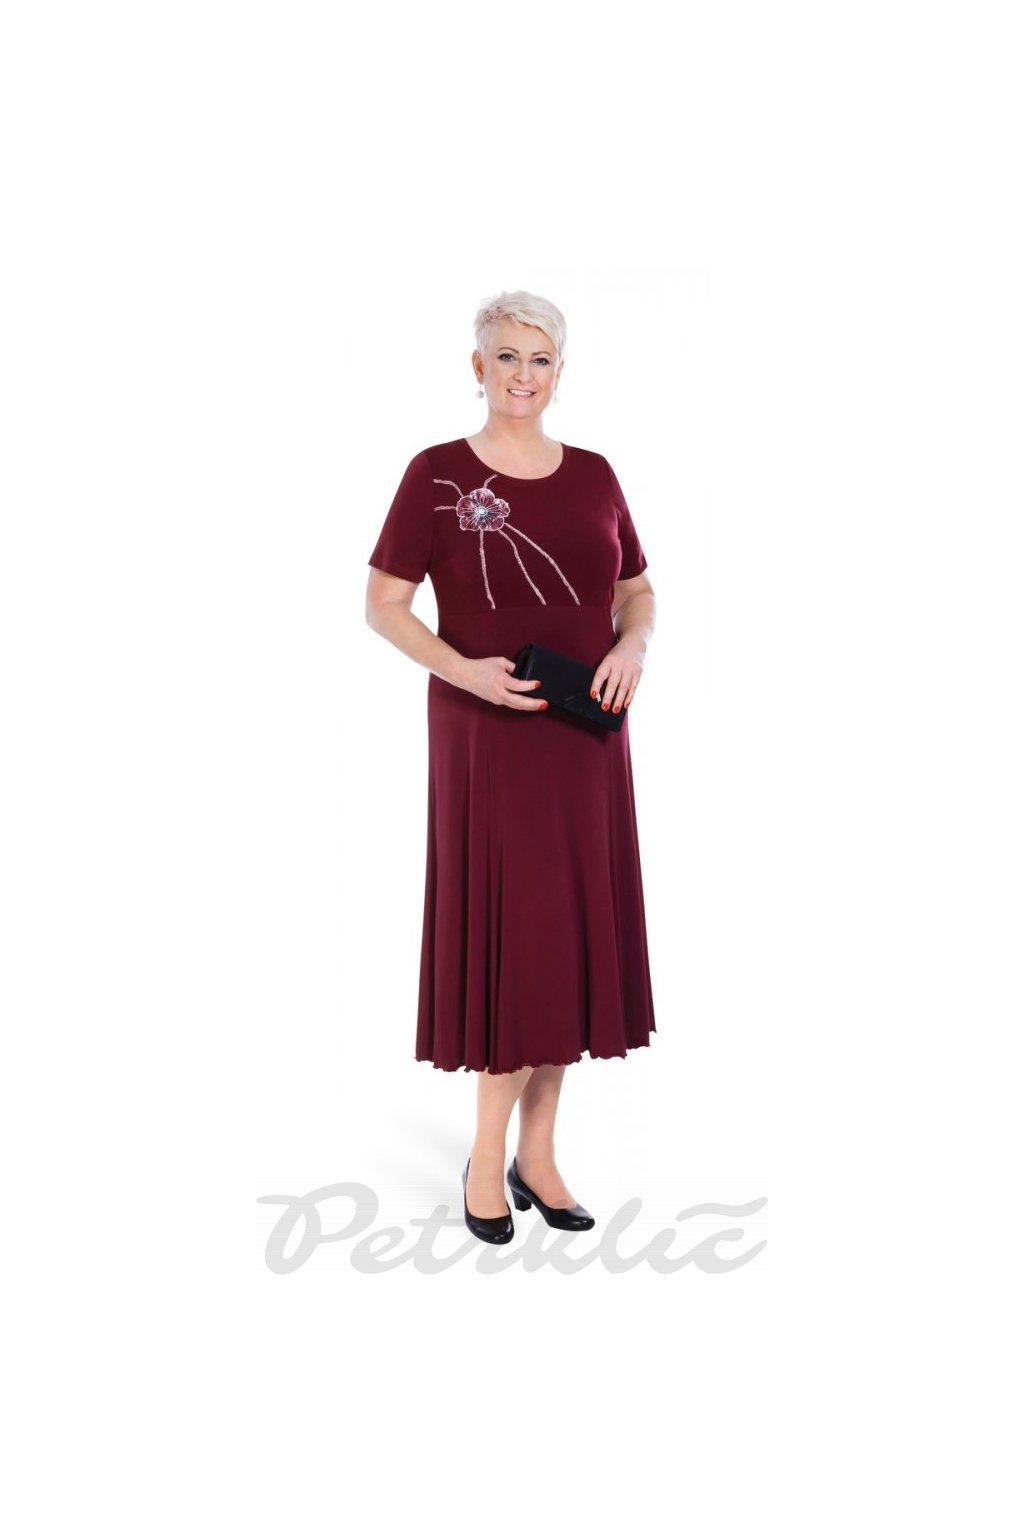 KATY - šaty krátký rukáv 120 - 125 cm